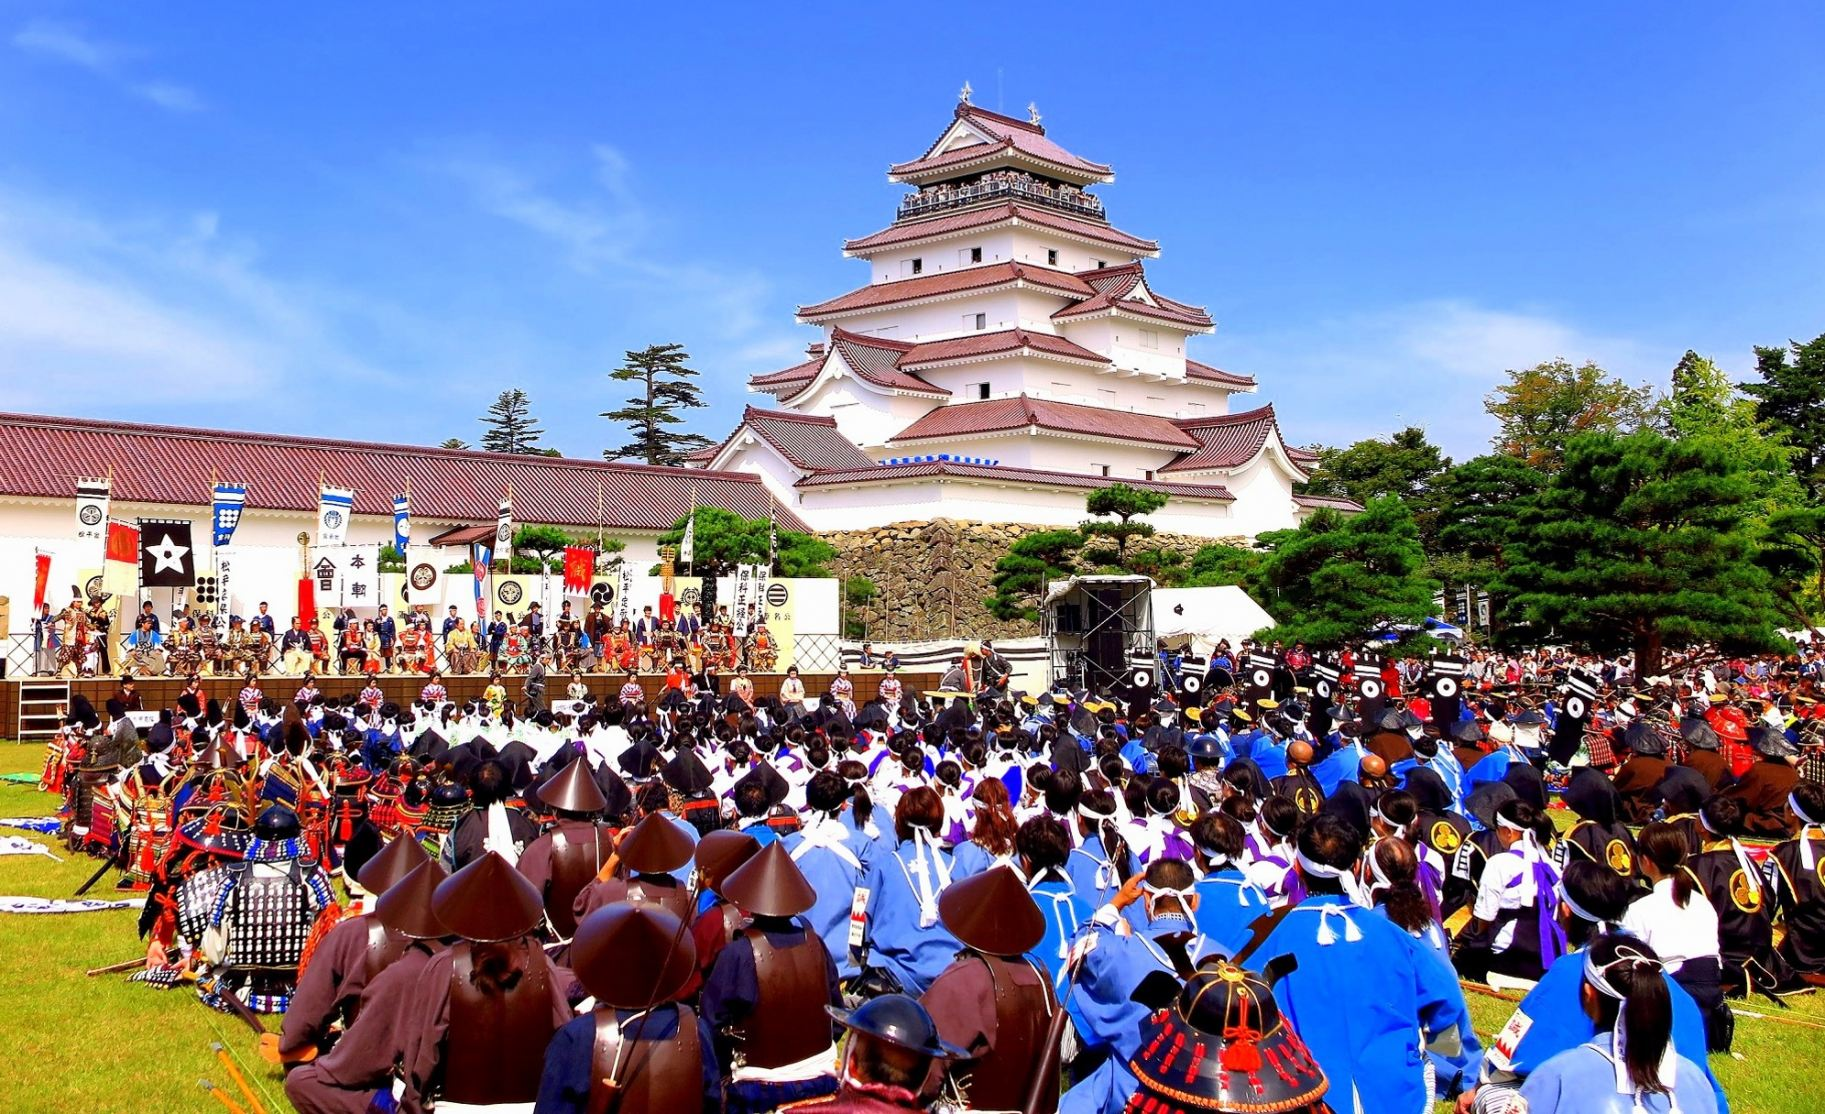 Aizu Wakamatsu Festival With Tsuruga Castle